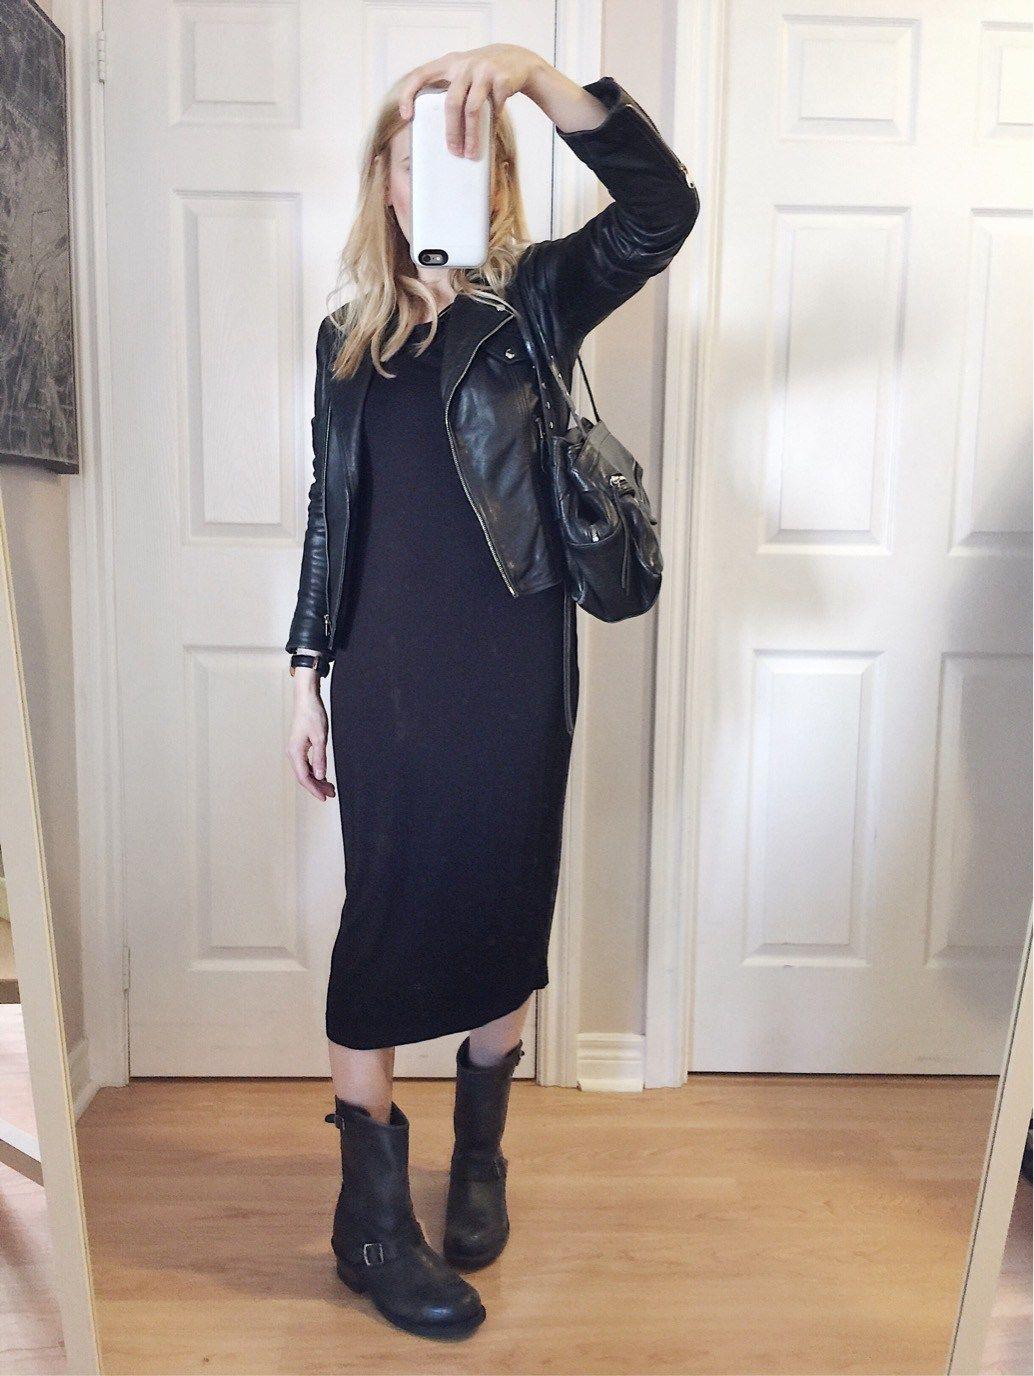 Black Sheath Dress Leather Jacket Frye Engineer Boots Leather Dress Outfit Casual Dress Outfits Sheath Dress Outfit [ 1376 x 1034 Pixel ]